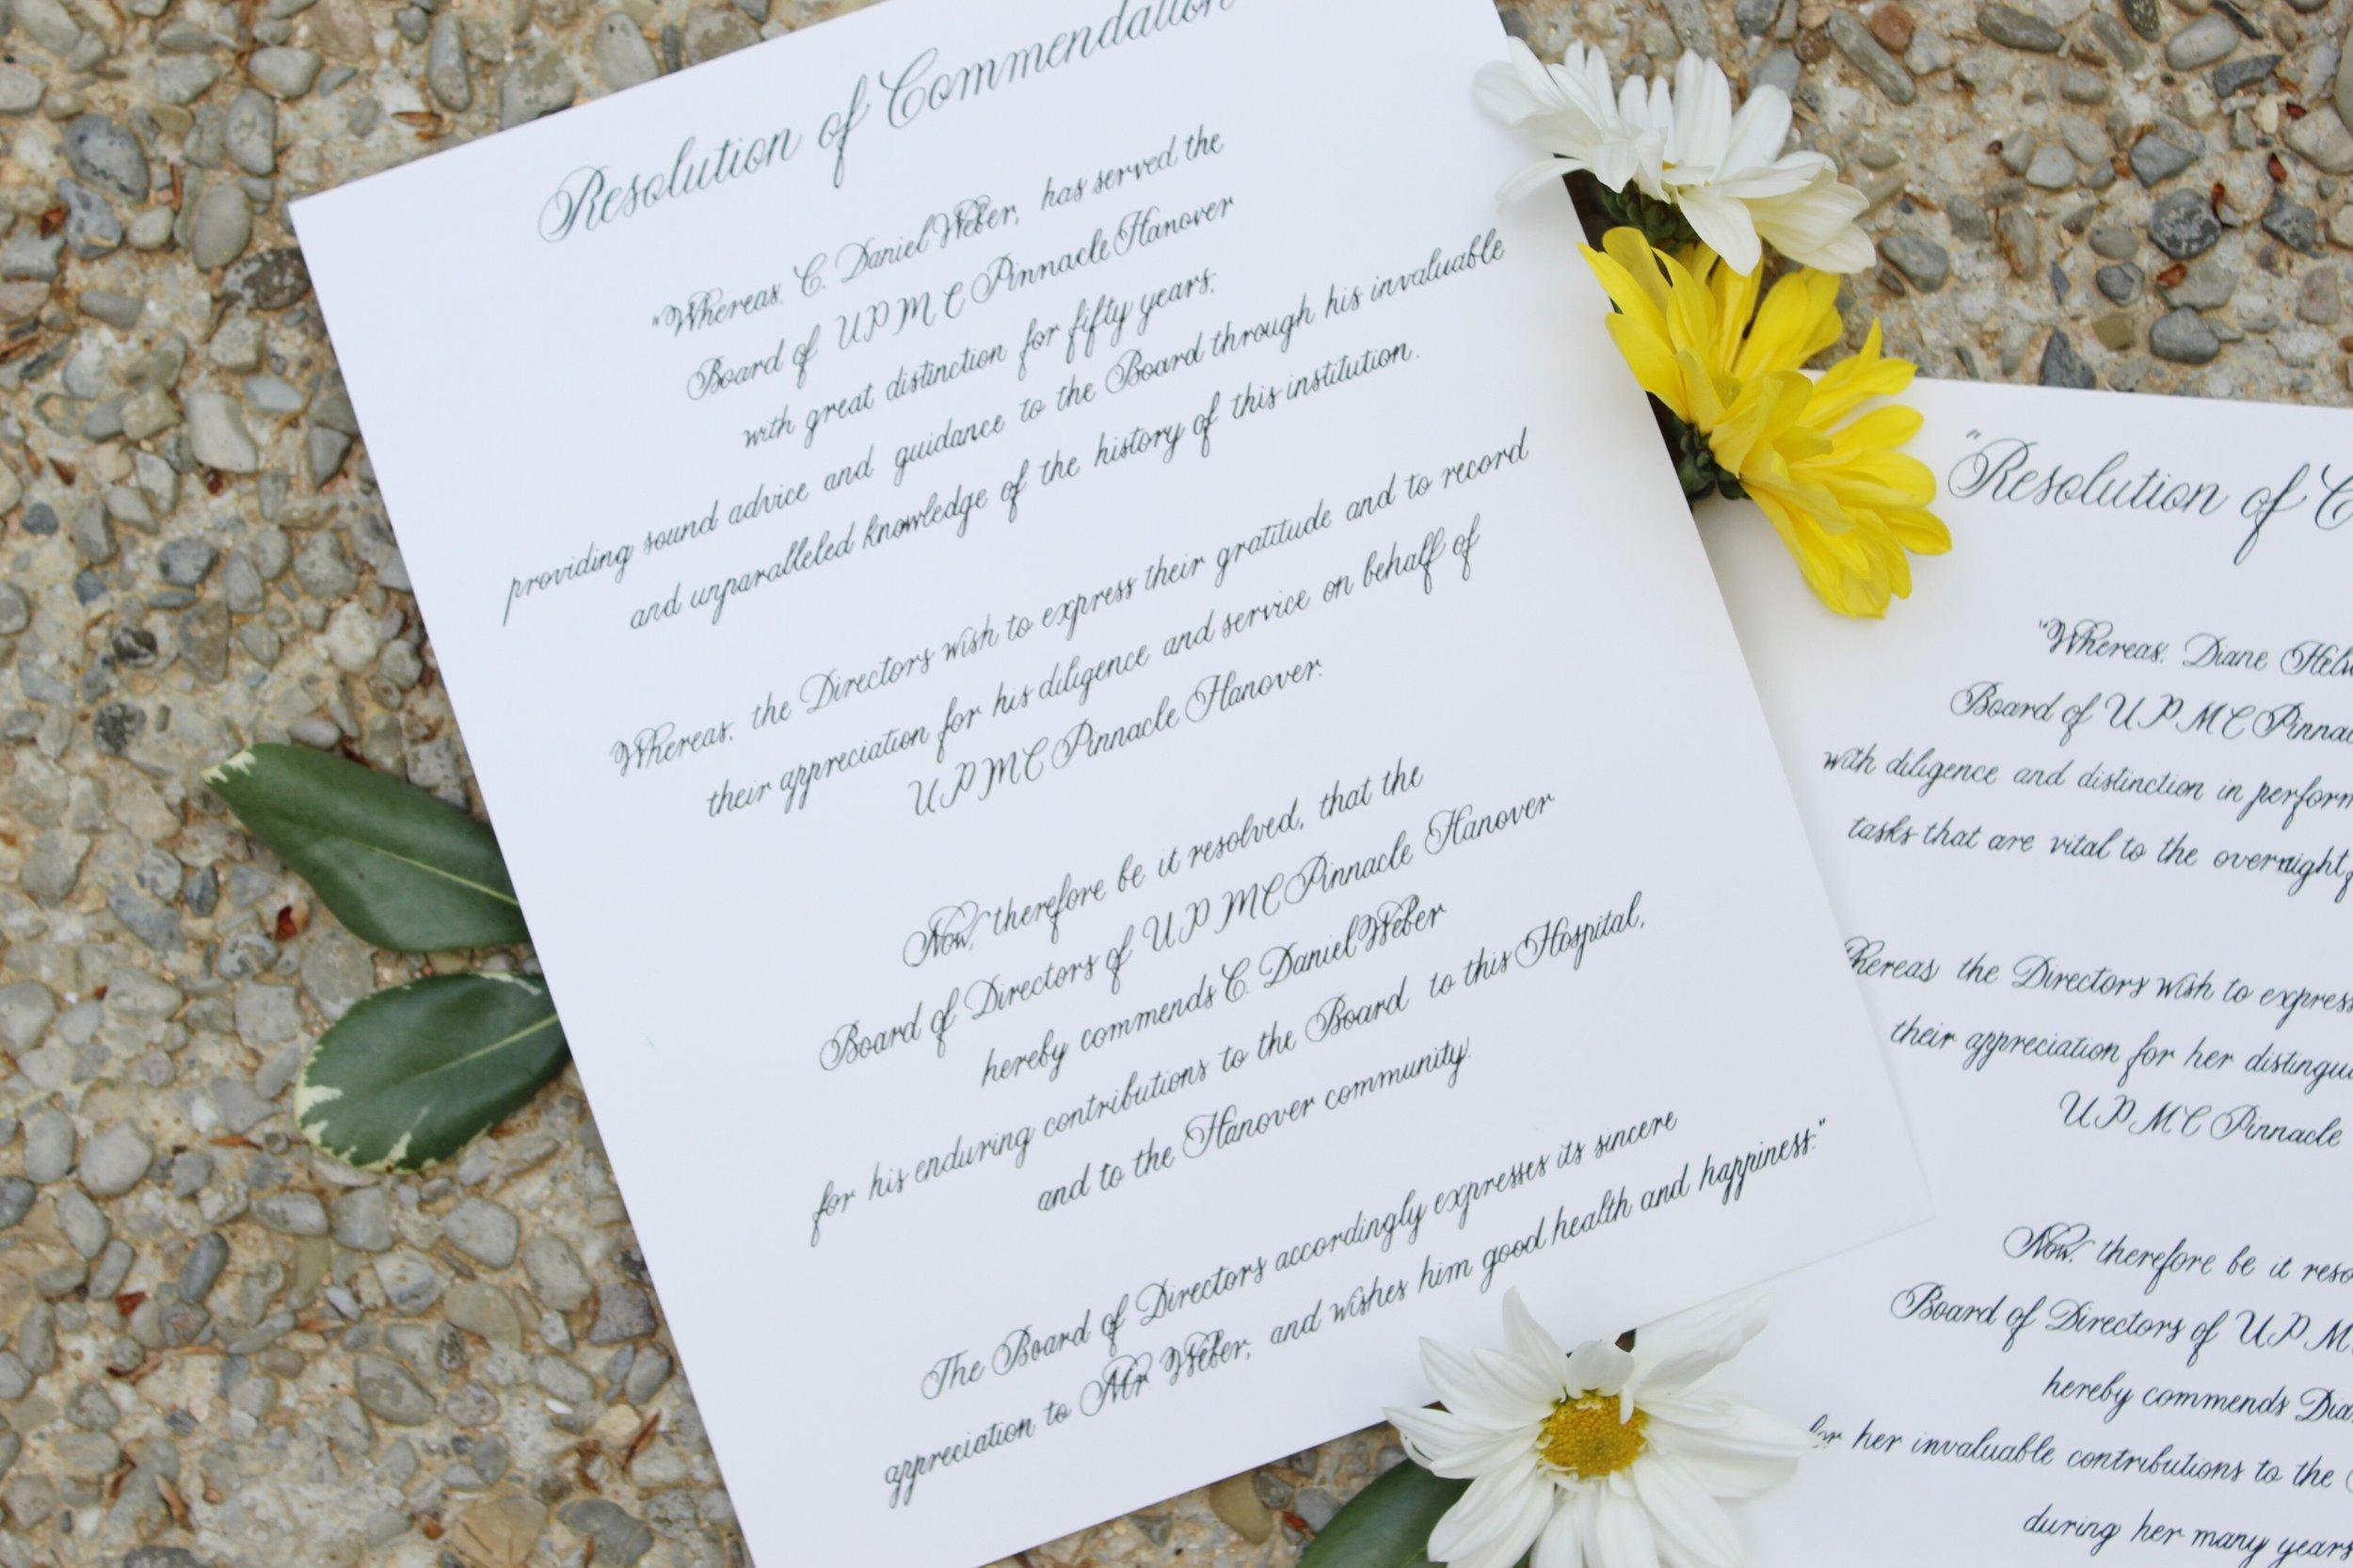 Central PA, York PA, JesSmith Designs, custom, wedding, invitations, bridal, announcements, save the date, baby, hanover, calligraphy, baltimore, wedding invitations, lancaster, gettysburg-05-10 17.14.45.jpg